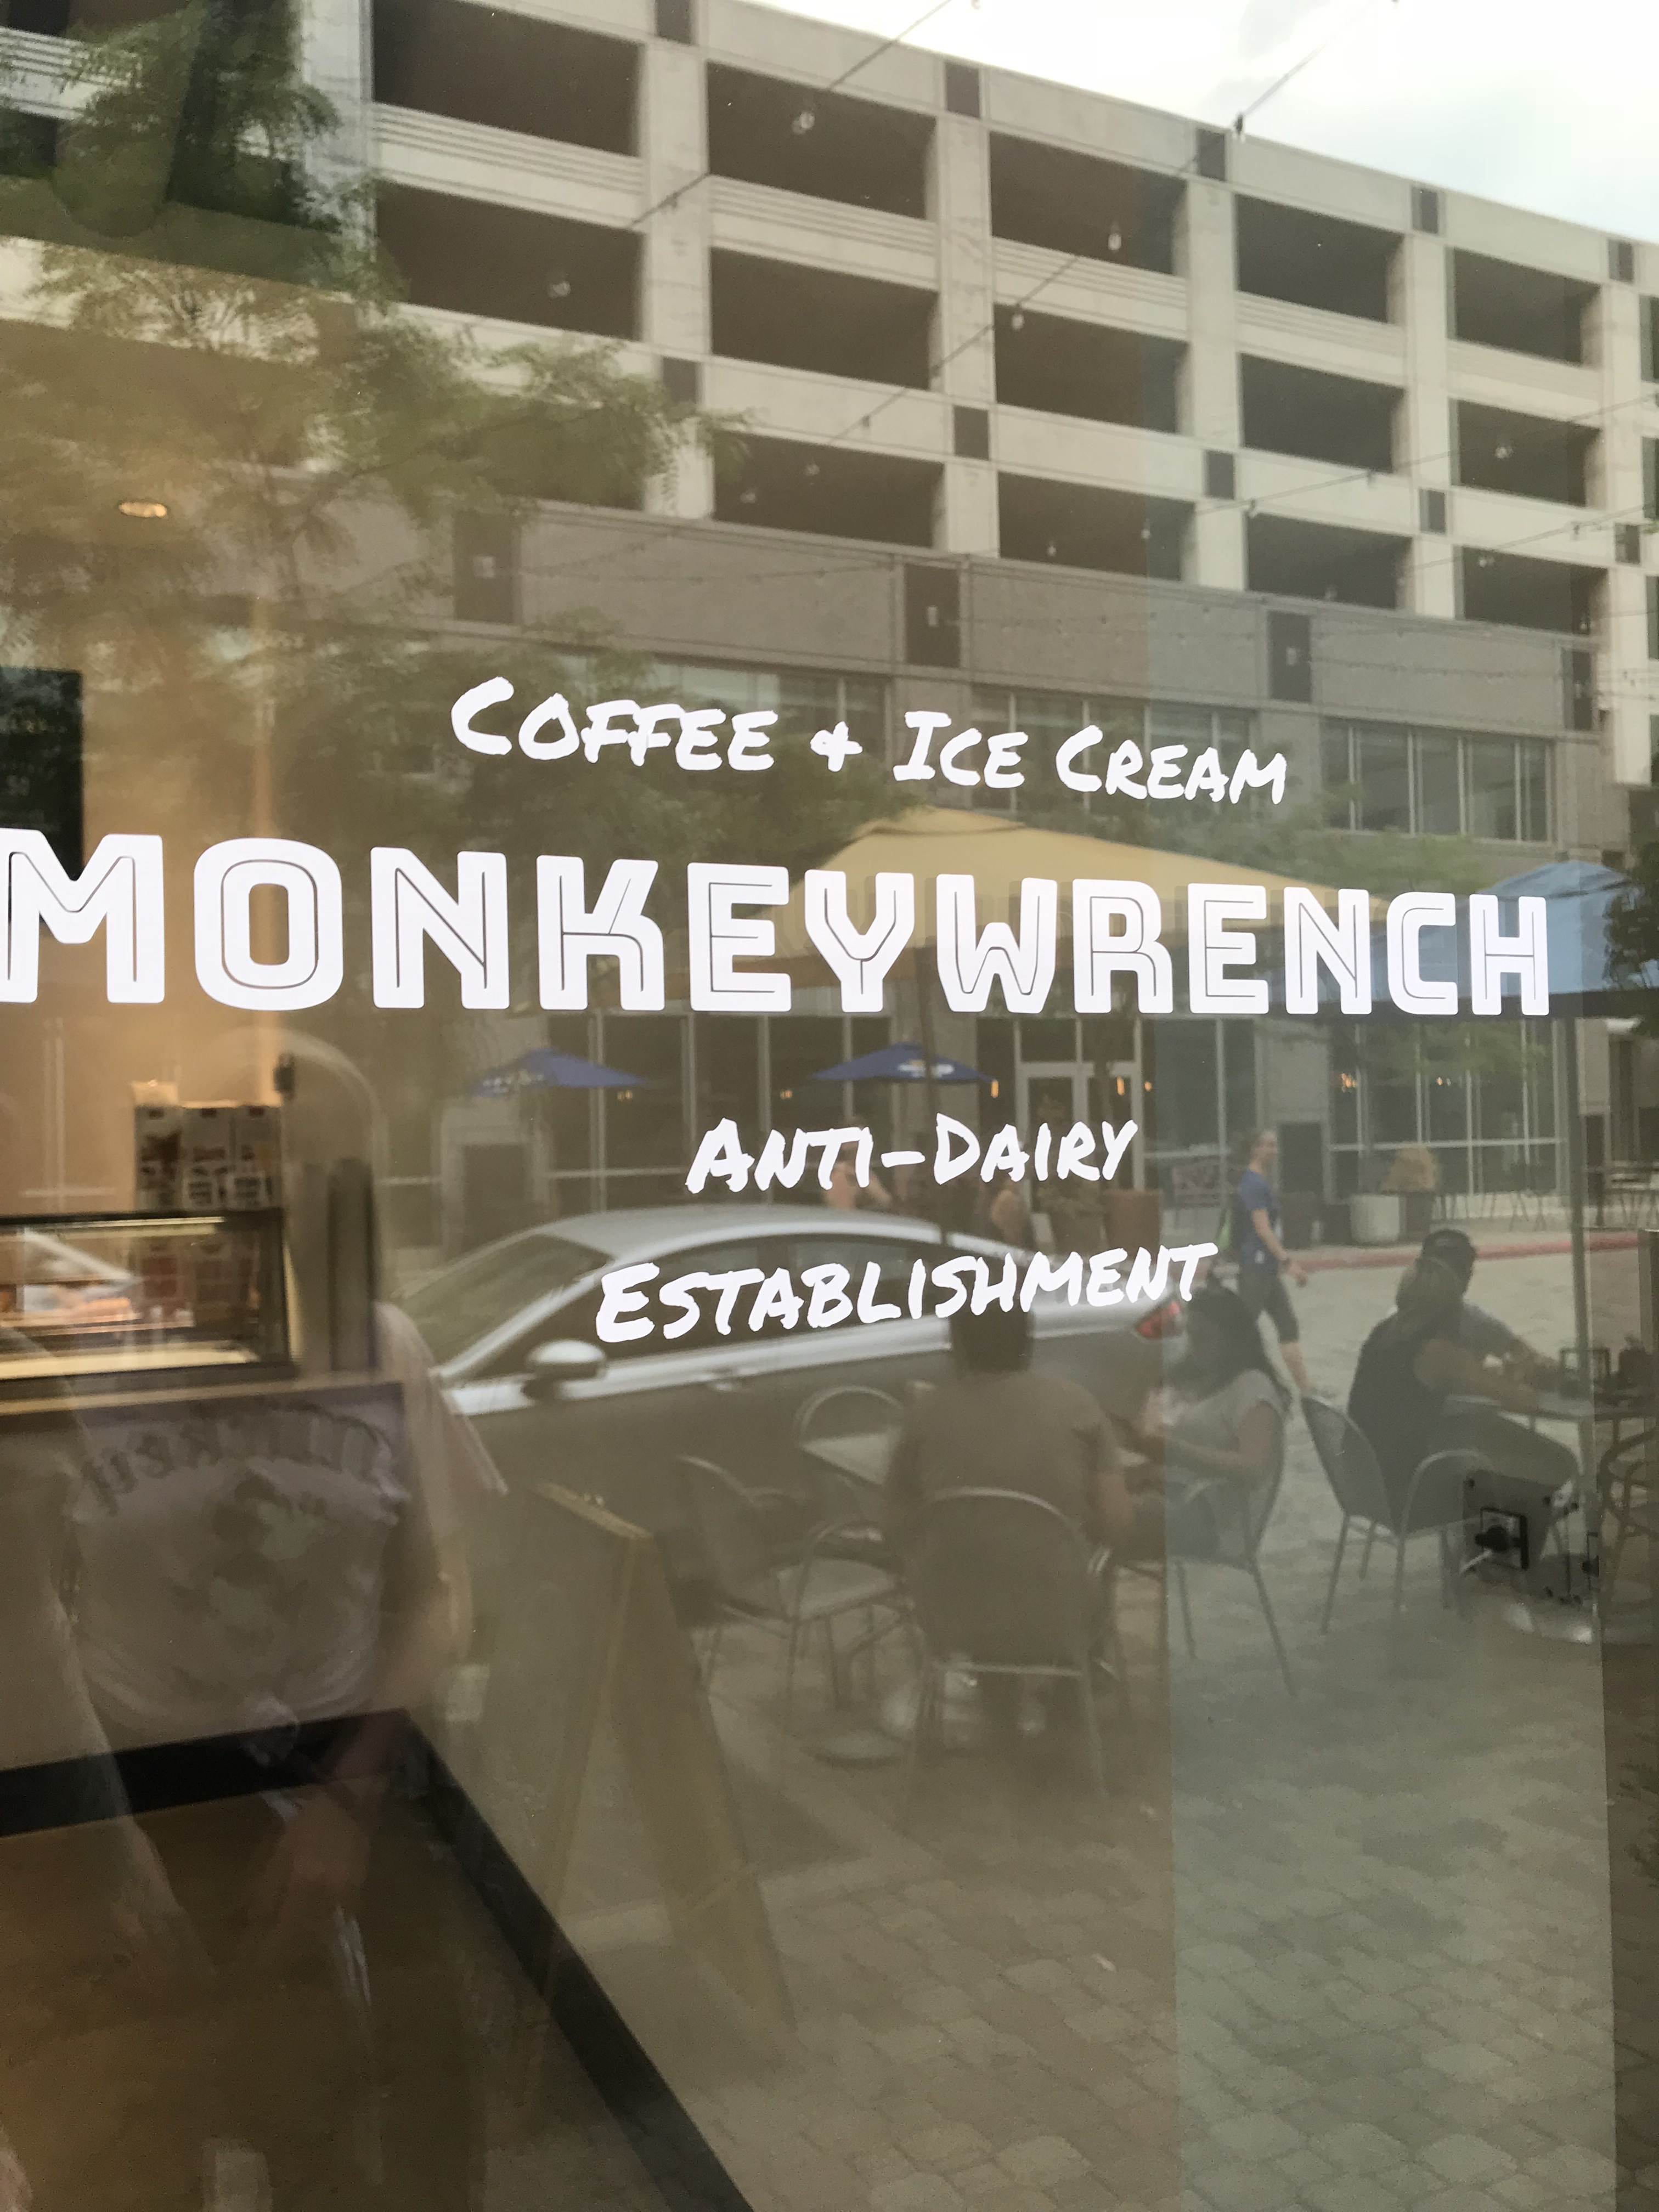 Monkeywrench Ice Cream